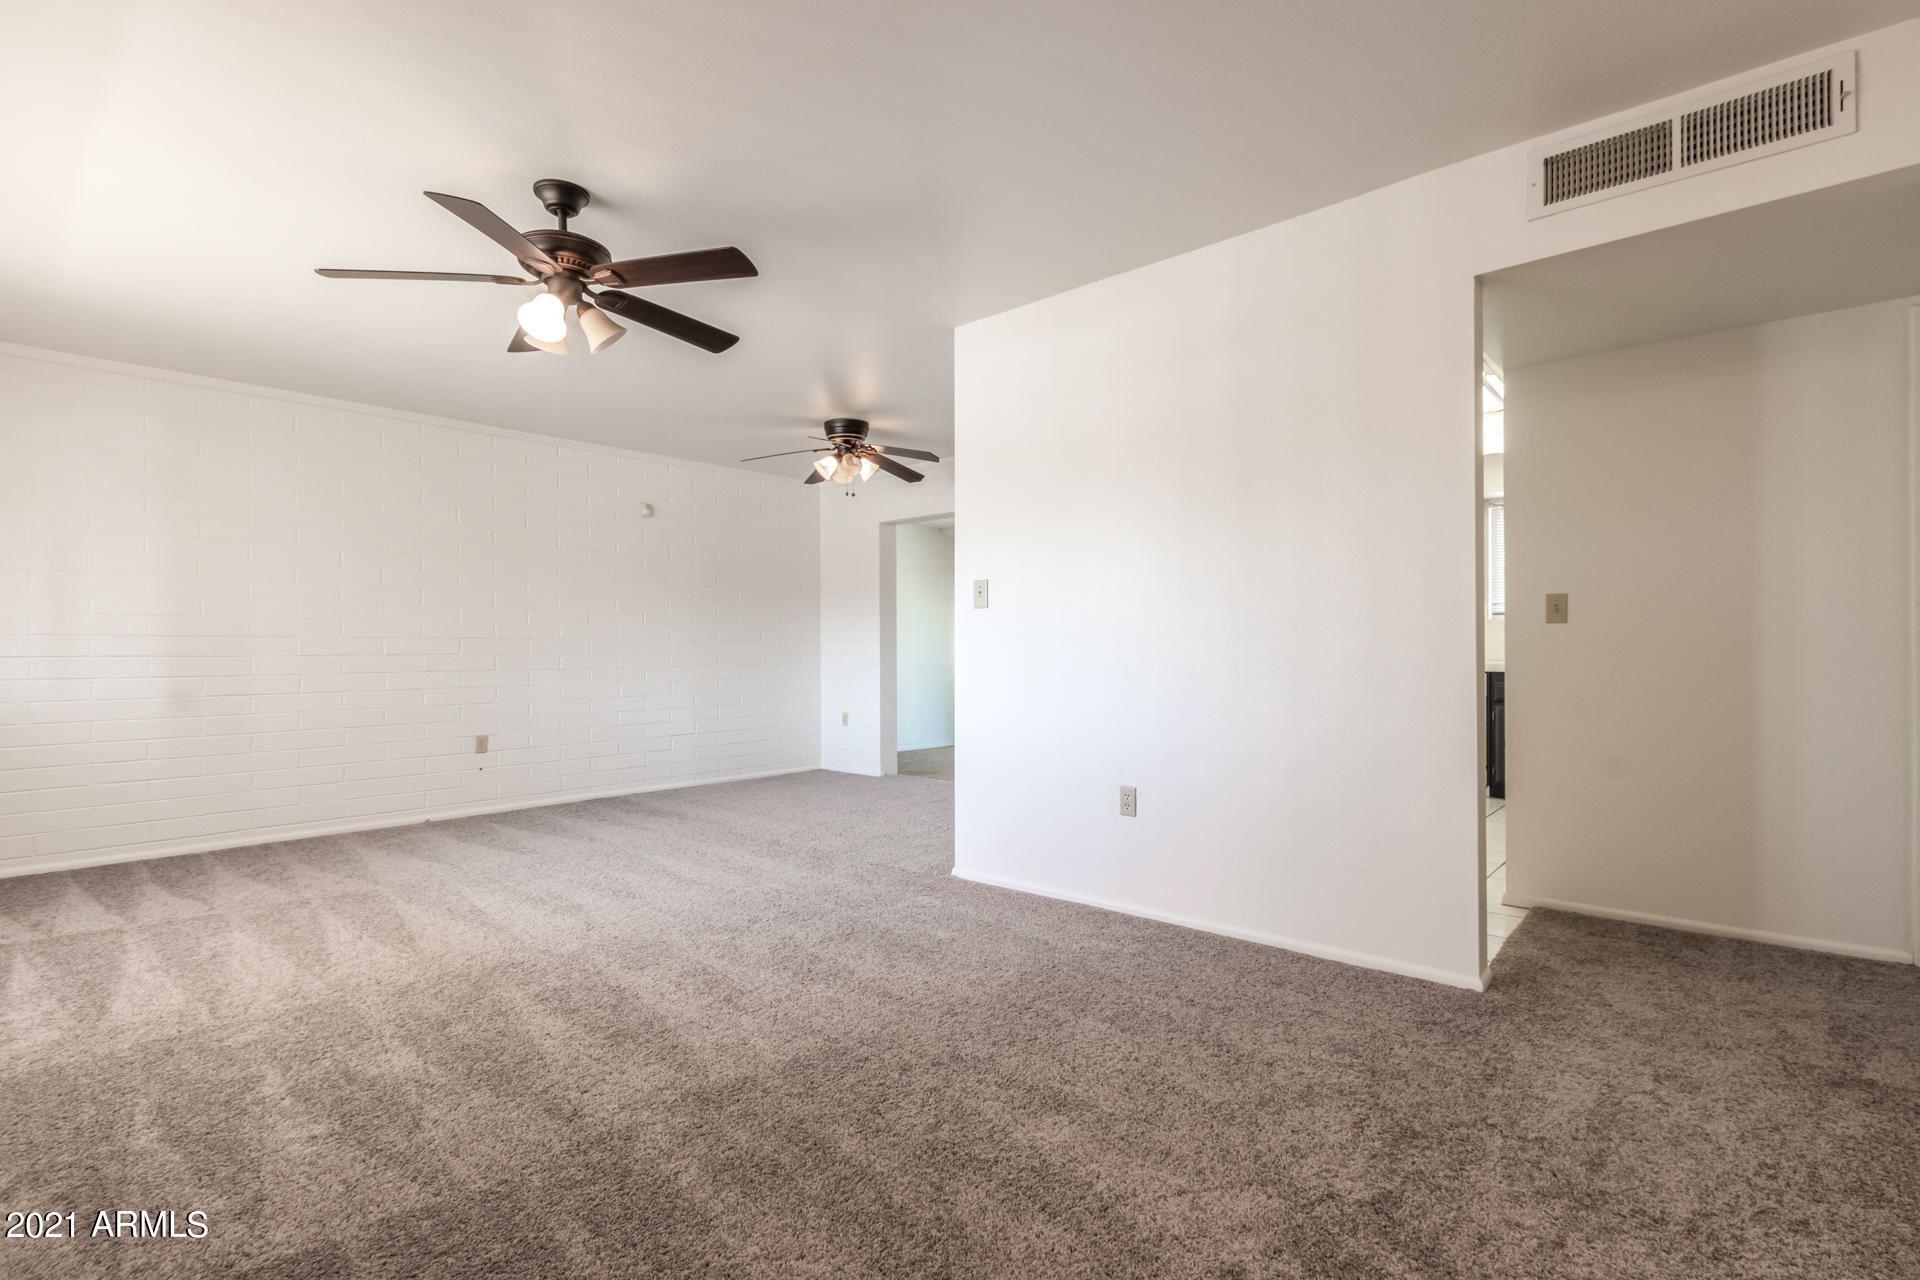 Photo of 9942 W DESERT HILLS Drive, Sun City, AZ 85351 (MLS # 6199717)